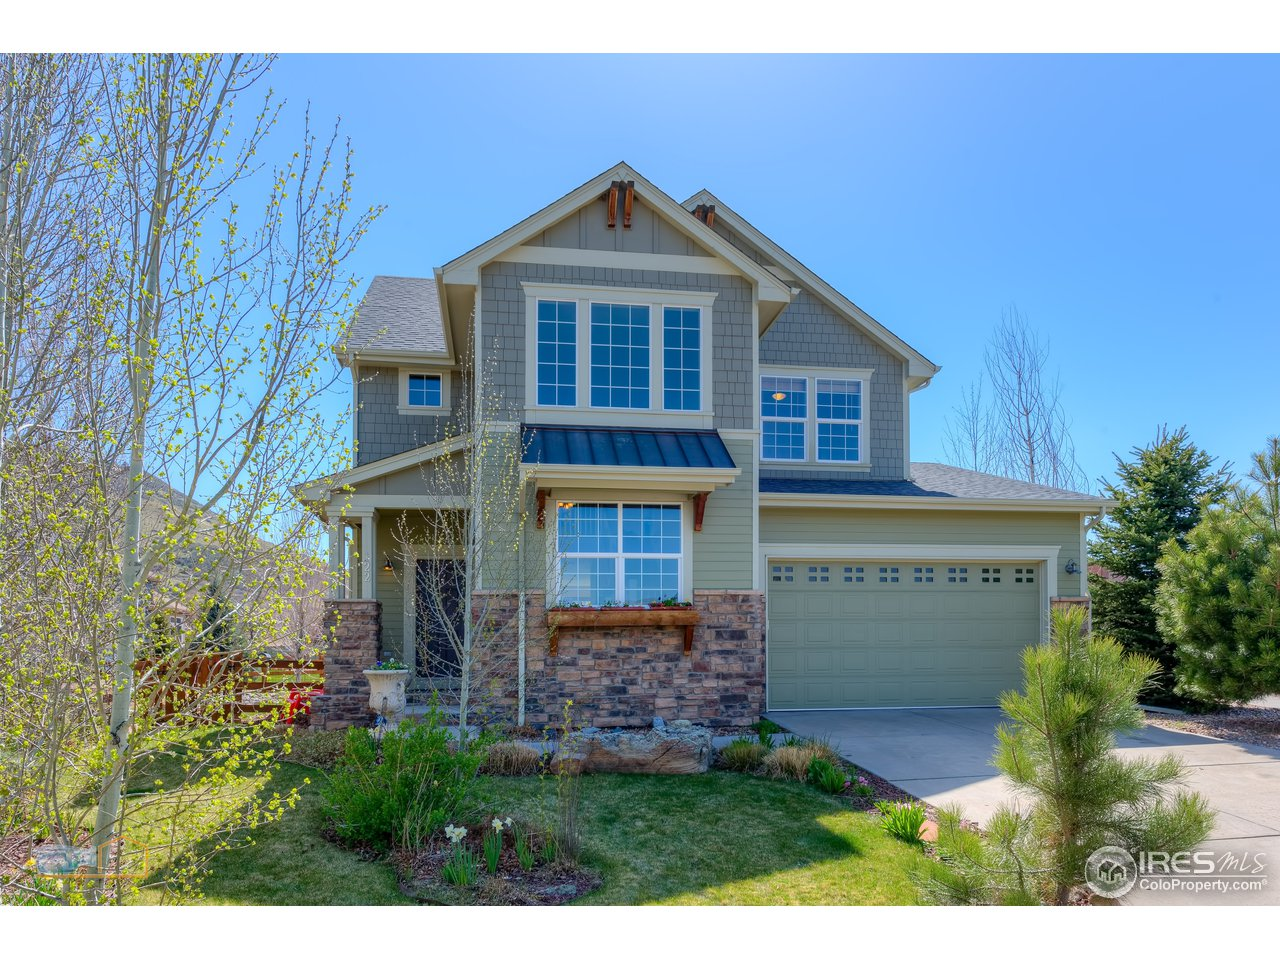 Lyons Colorado Homes for Sale